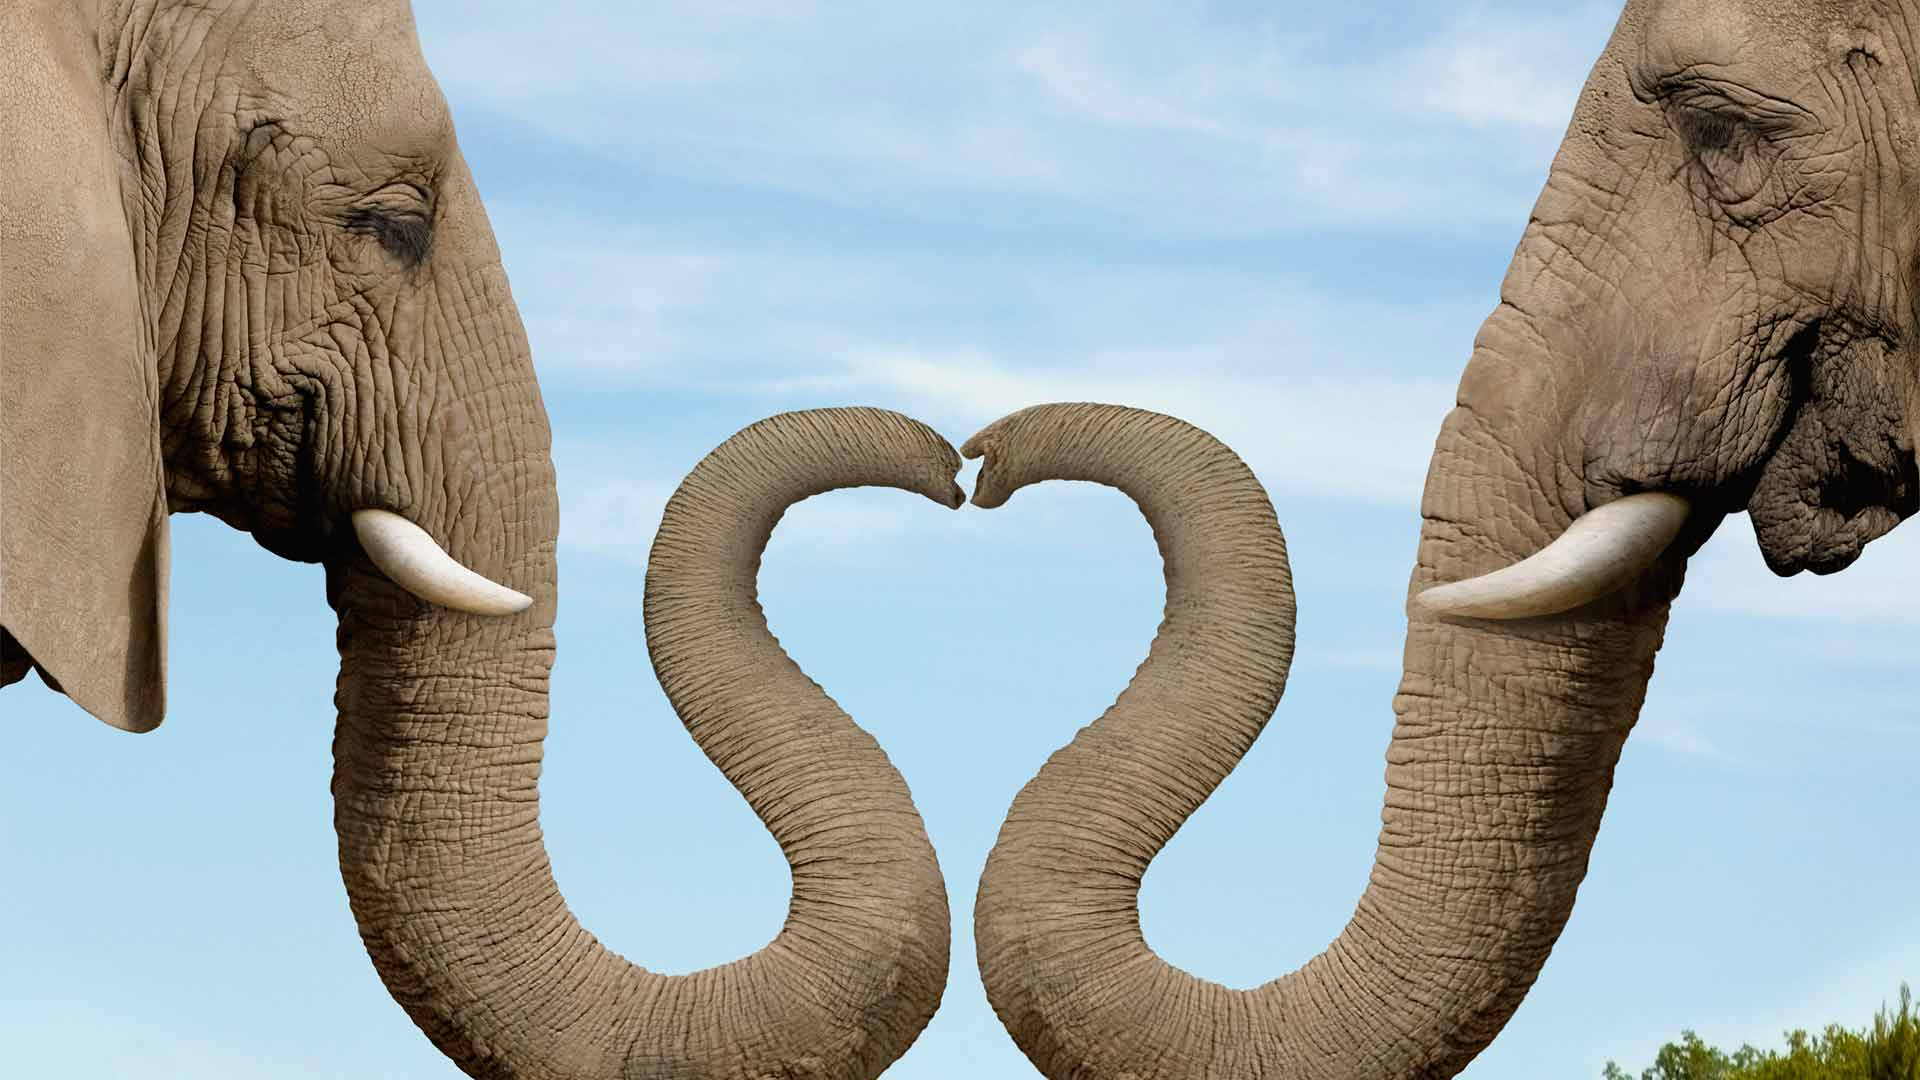 love nose cute elephant wallpaper animal desktop background